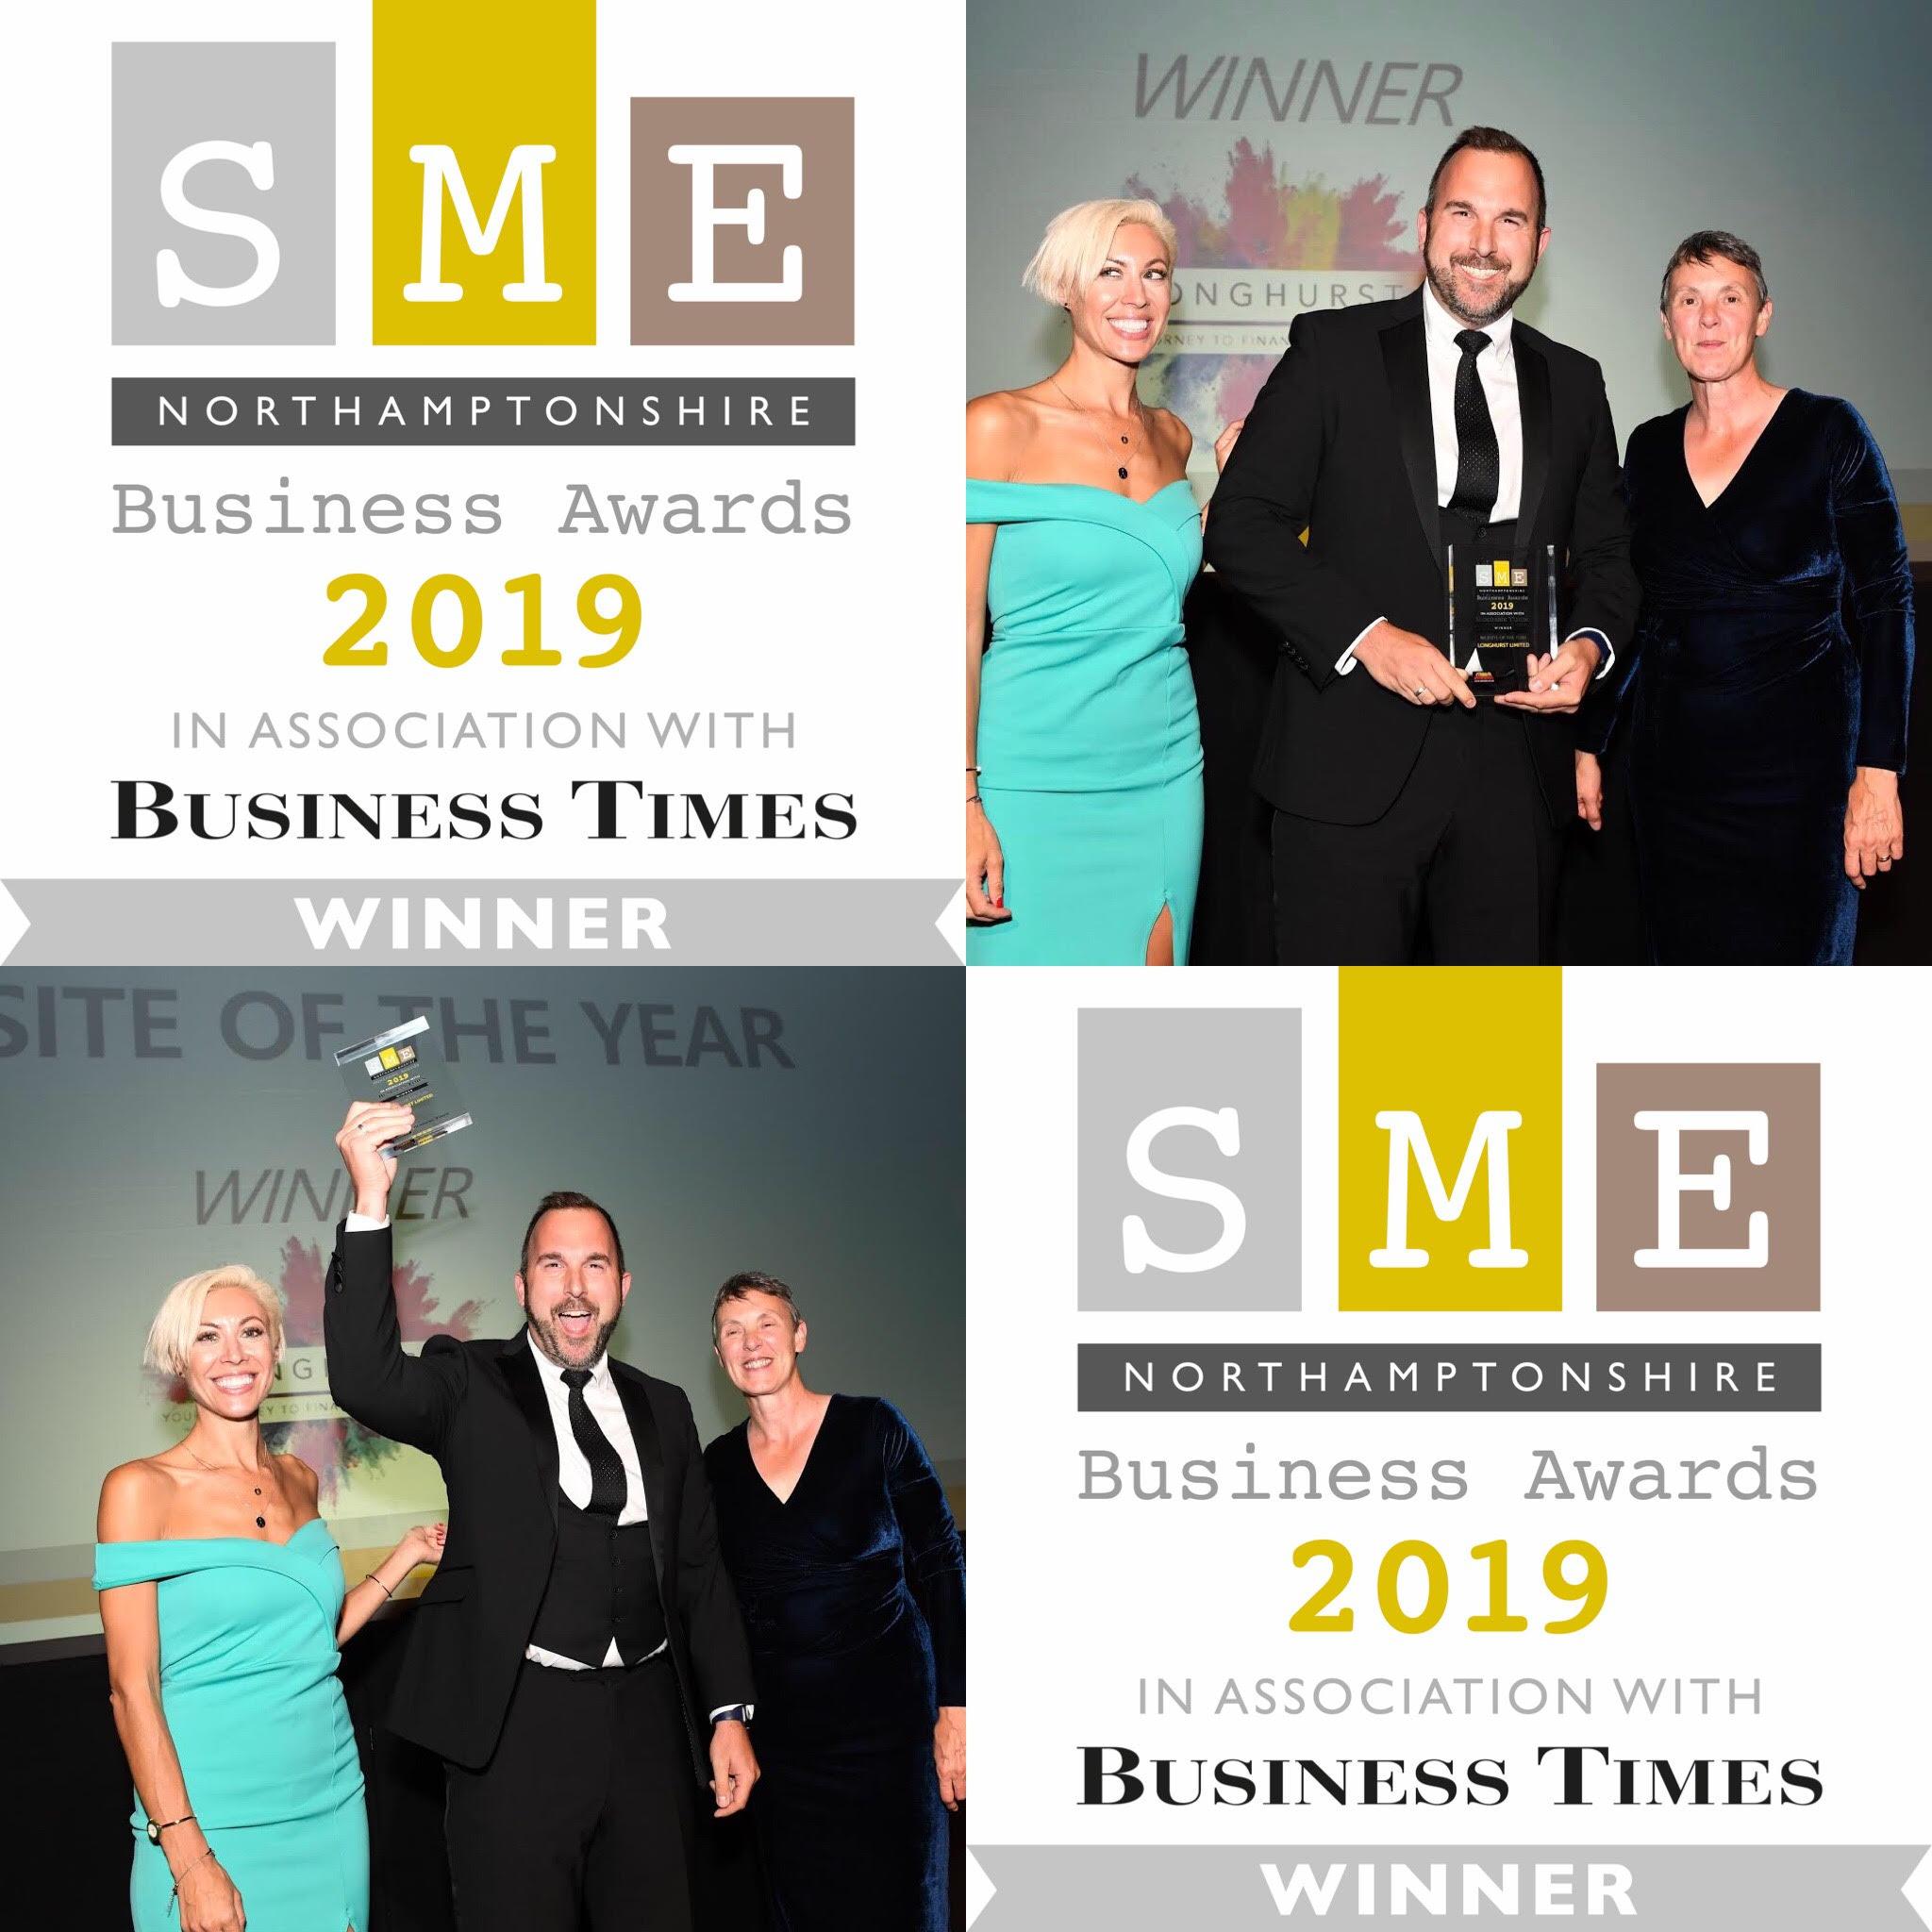 Longhurst - SME Northamptonshire Awards